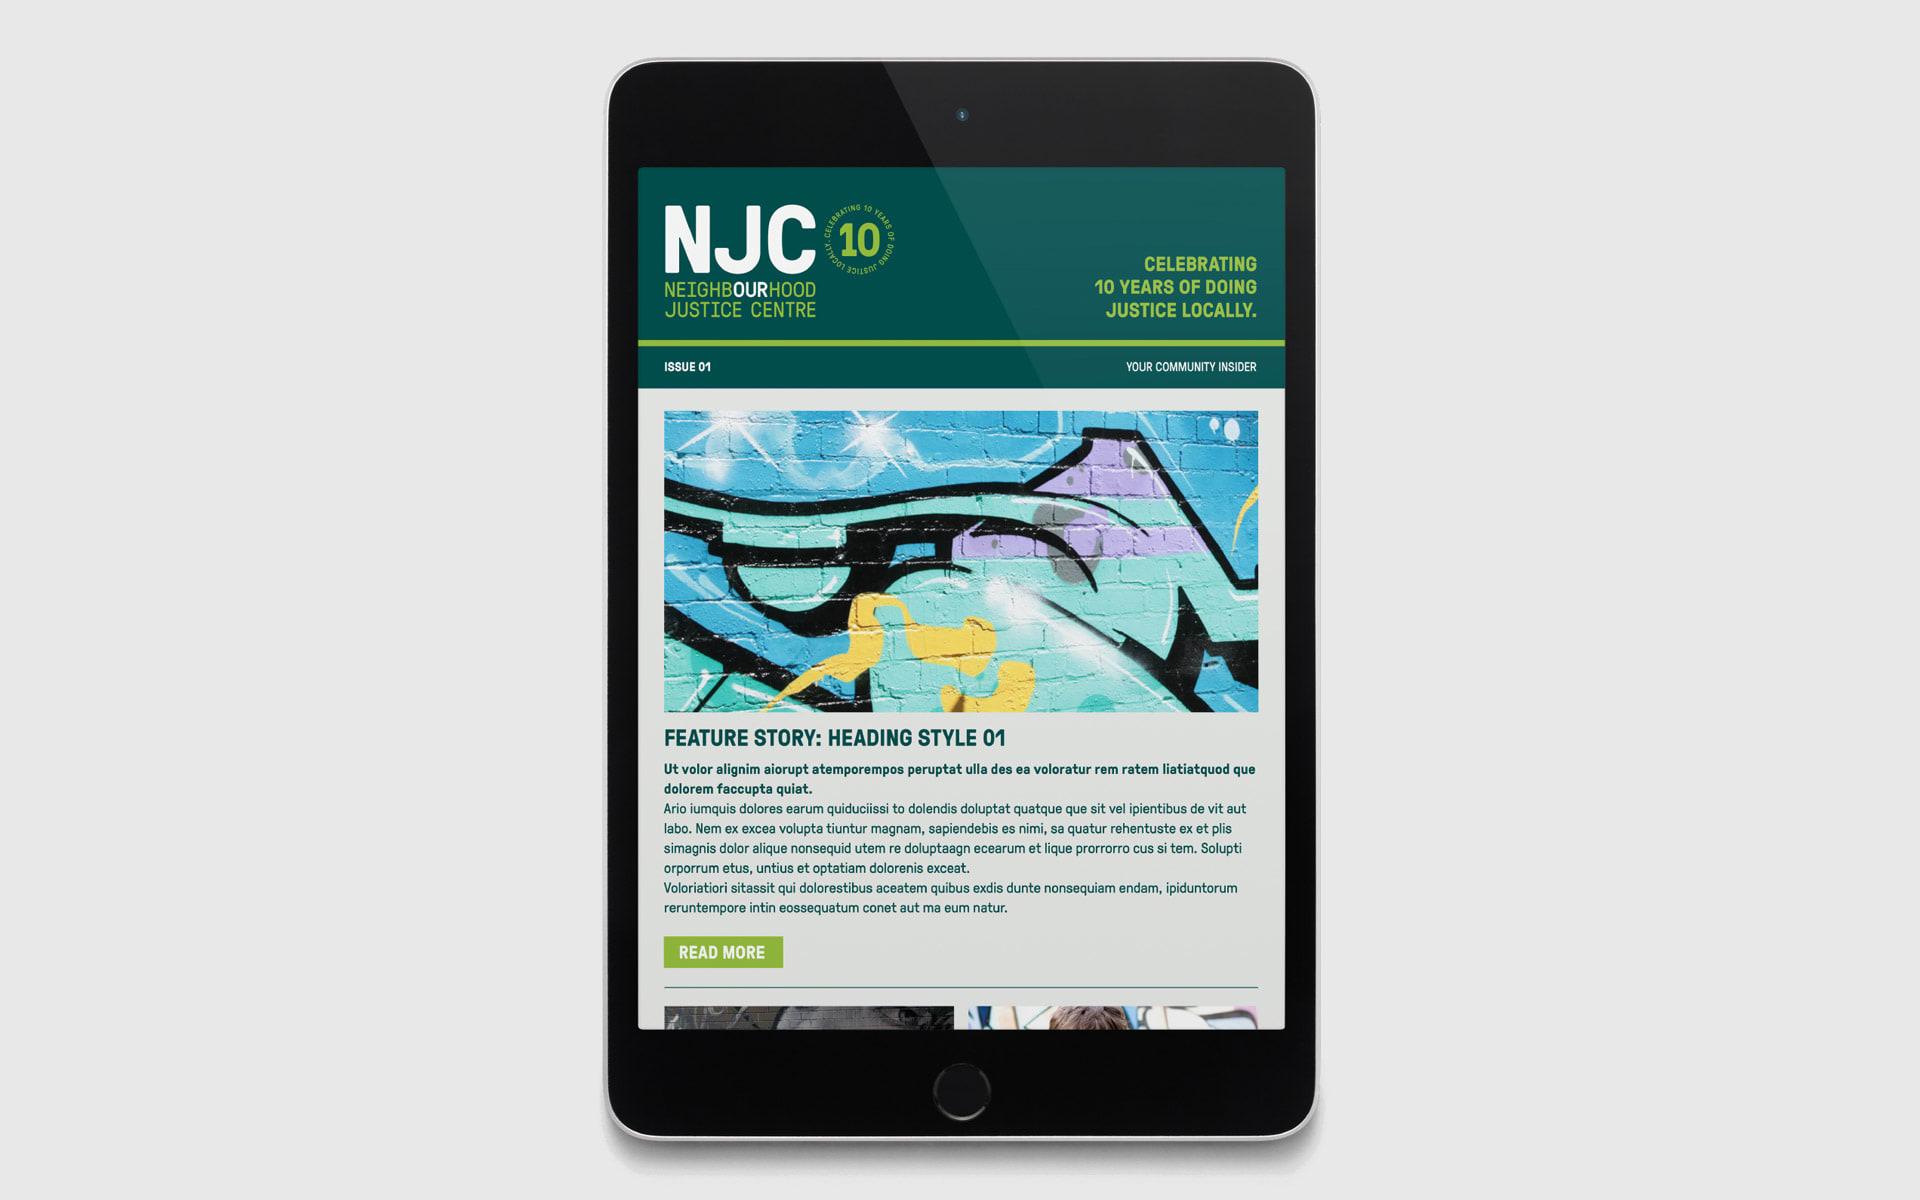 neighbourhood-justice-centre-brand-refresh-website-design